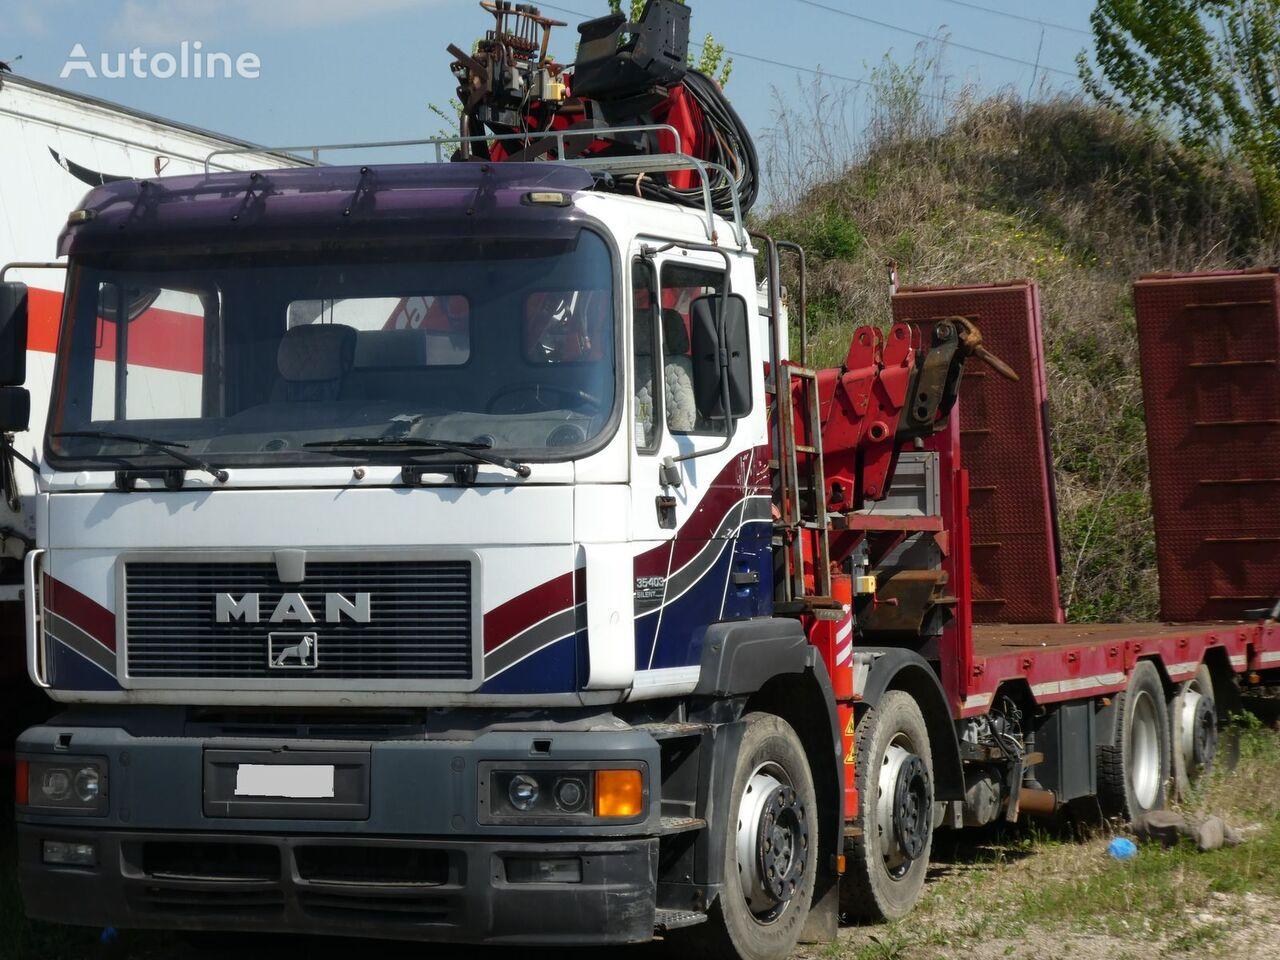 MAN F2000 35.401 SILENT kamion platforma